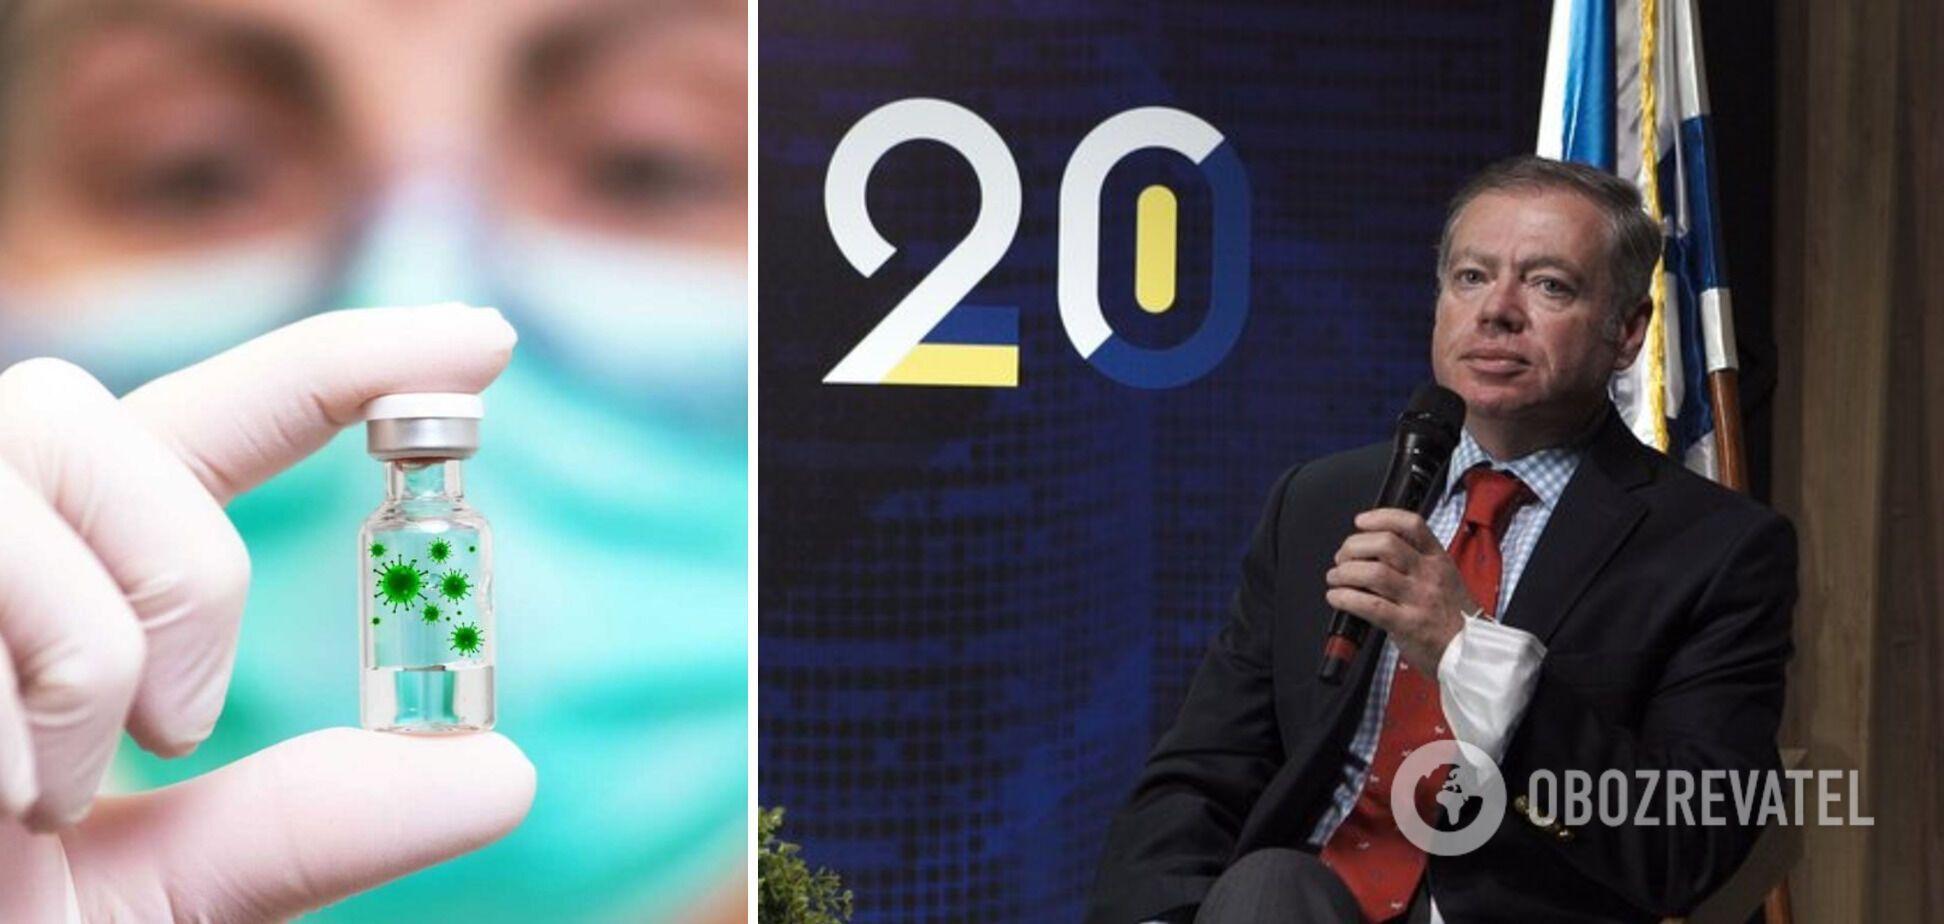 Посол Корнийчук провёл встречу с представителем компании NRx по вопросу вакцин против COVID-19